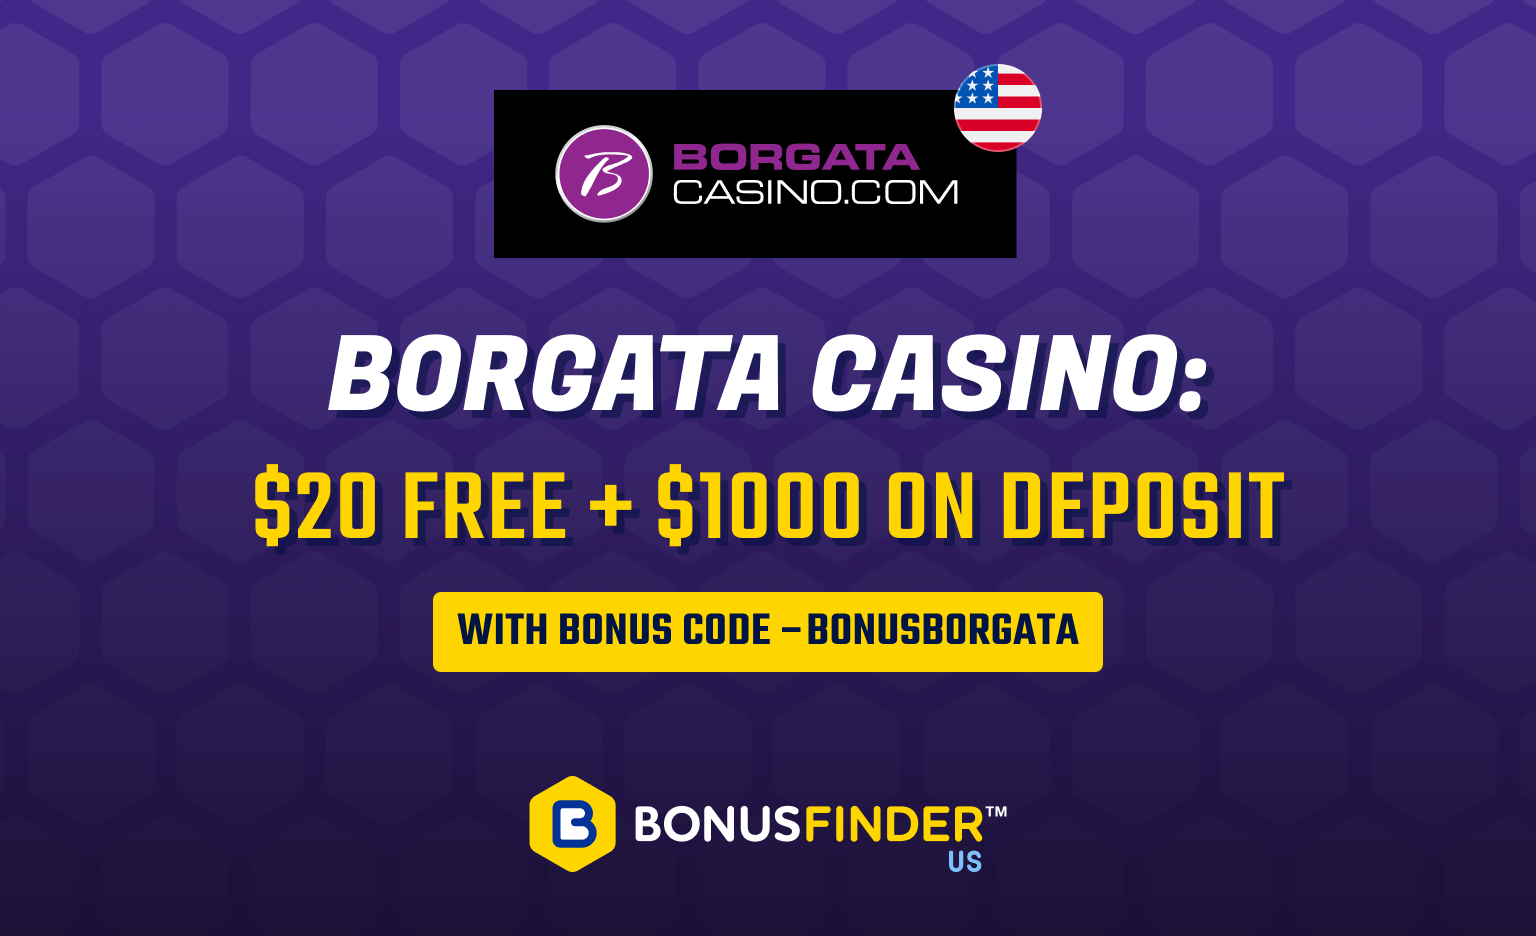 Borgata Online Casino Bonus Code